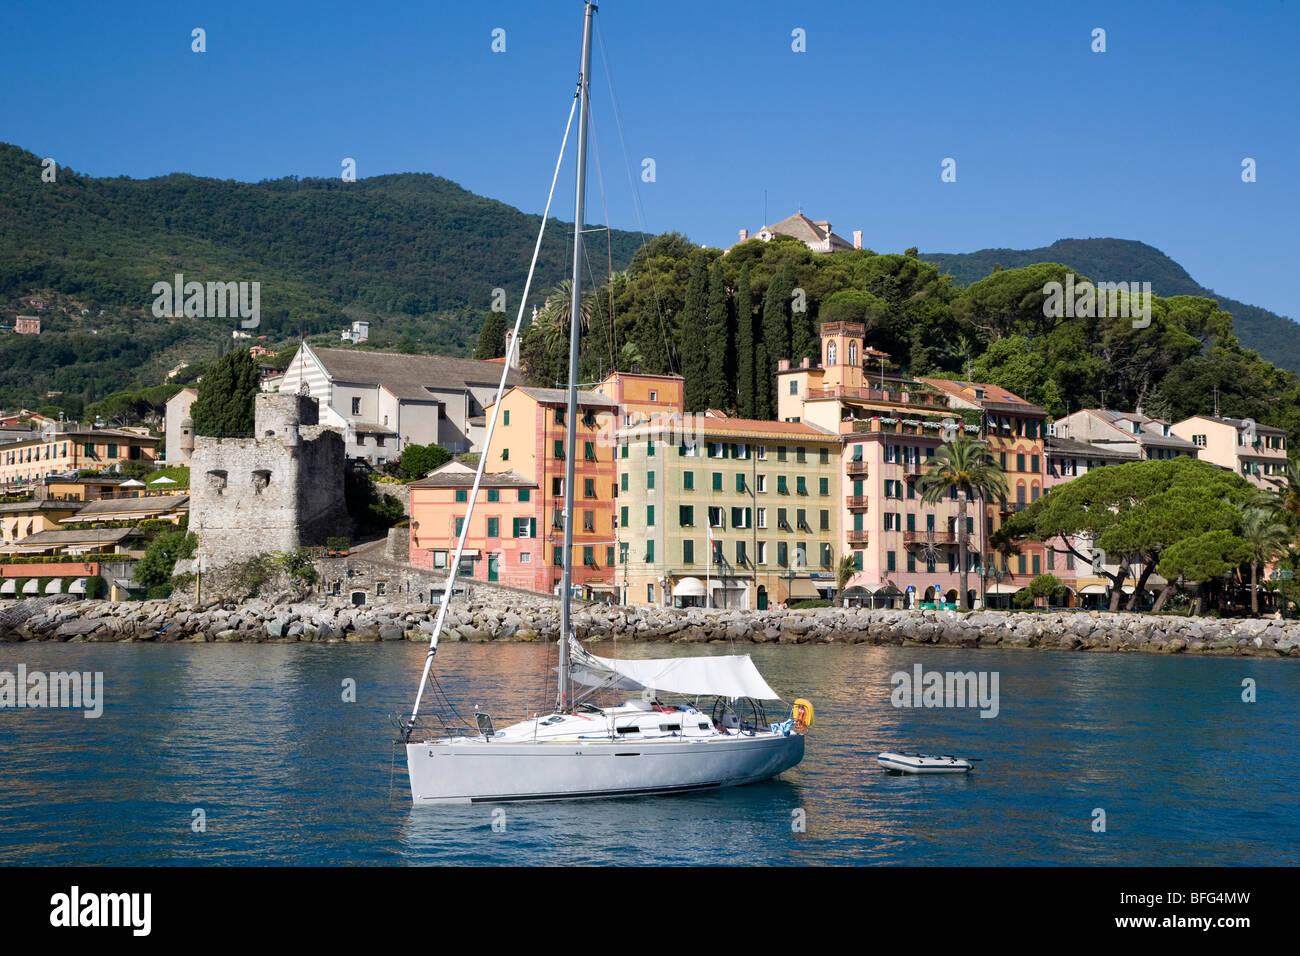 Water front of Santa margherita ligure, Italy Stock Photo